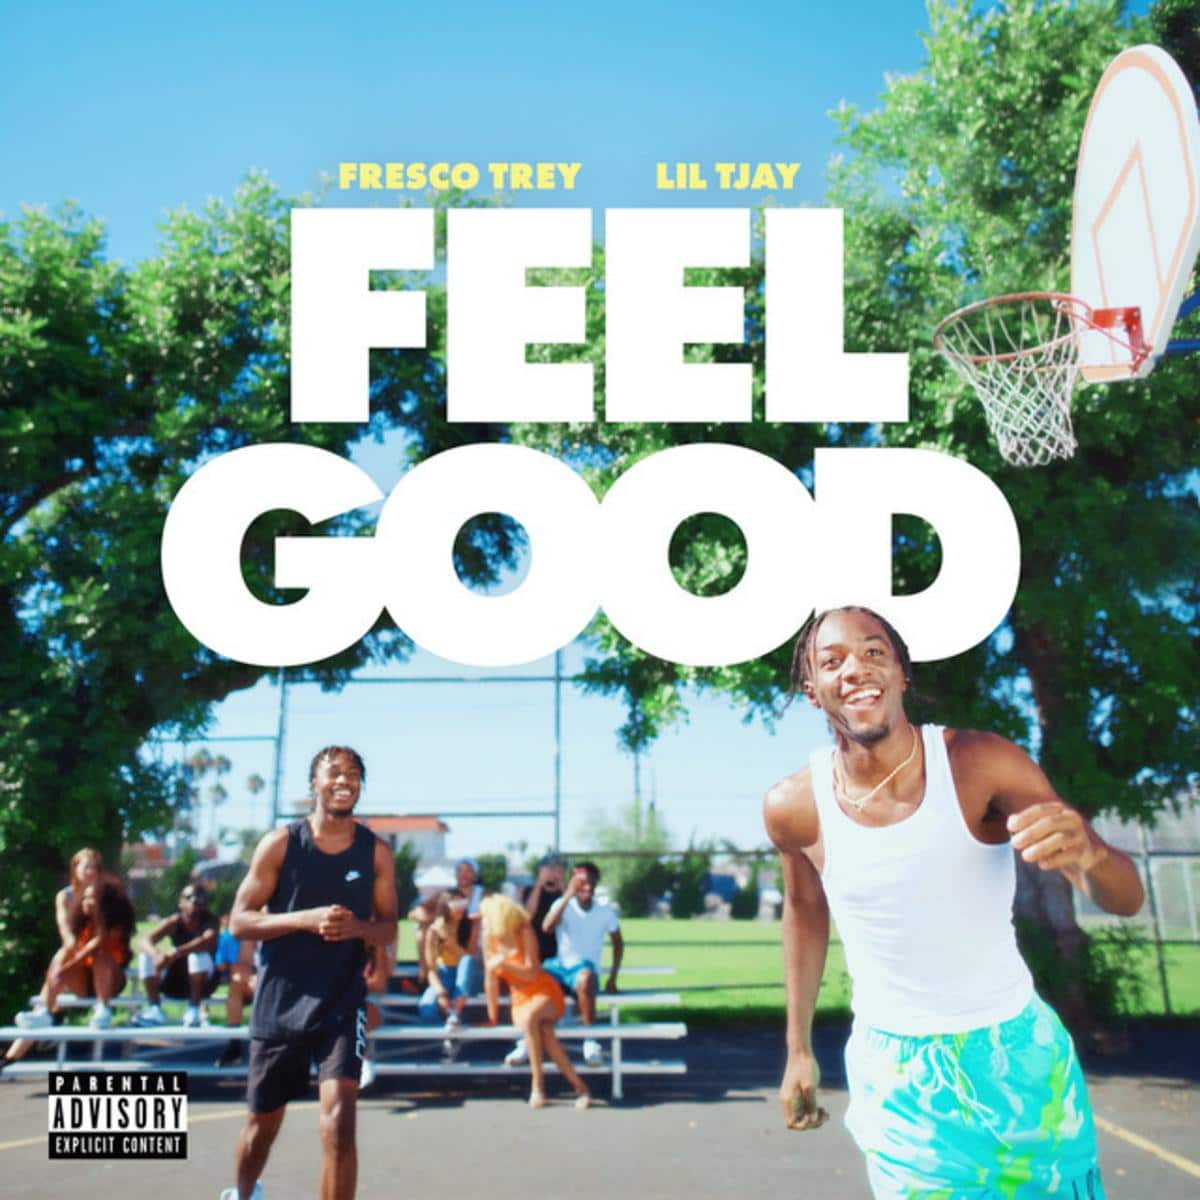 Fresco Trey Ft. Lil Tjay - Feel Good Mp3